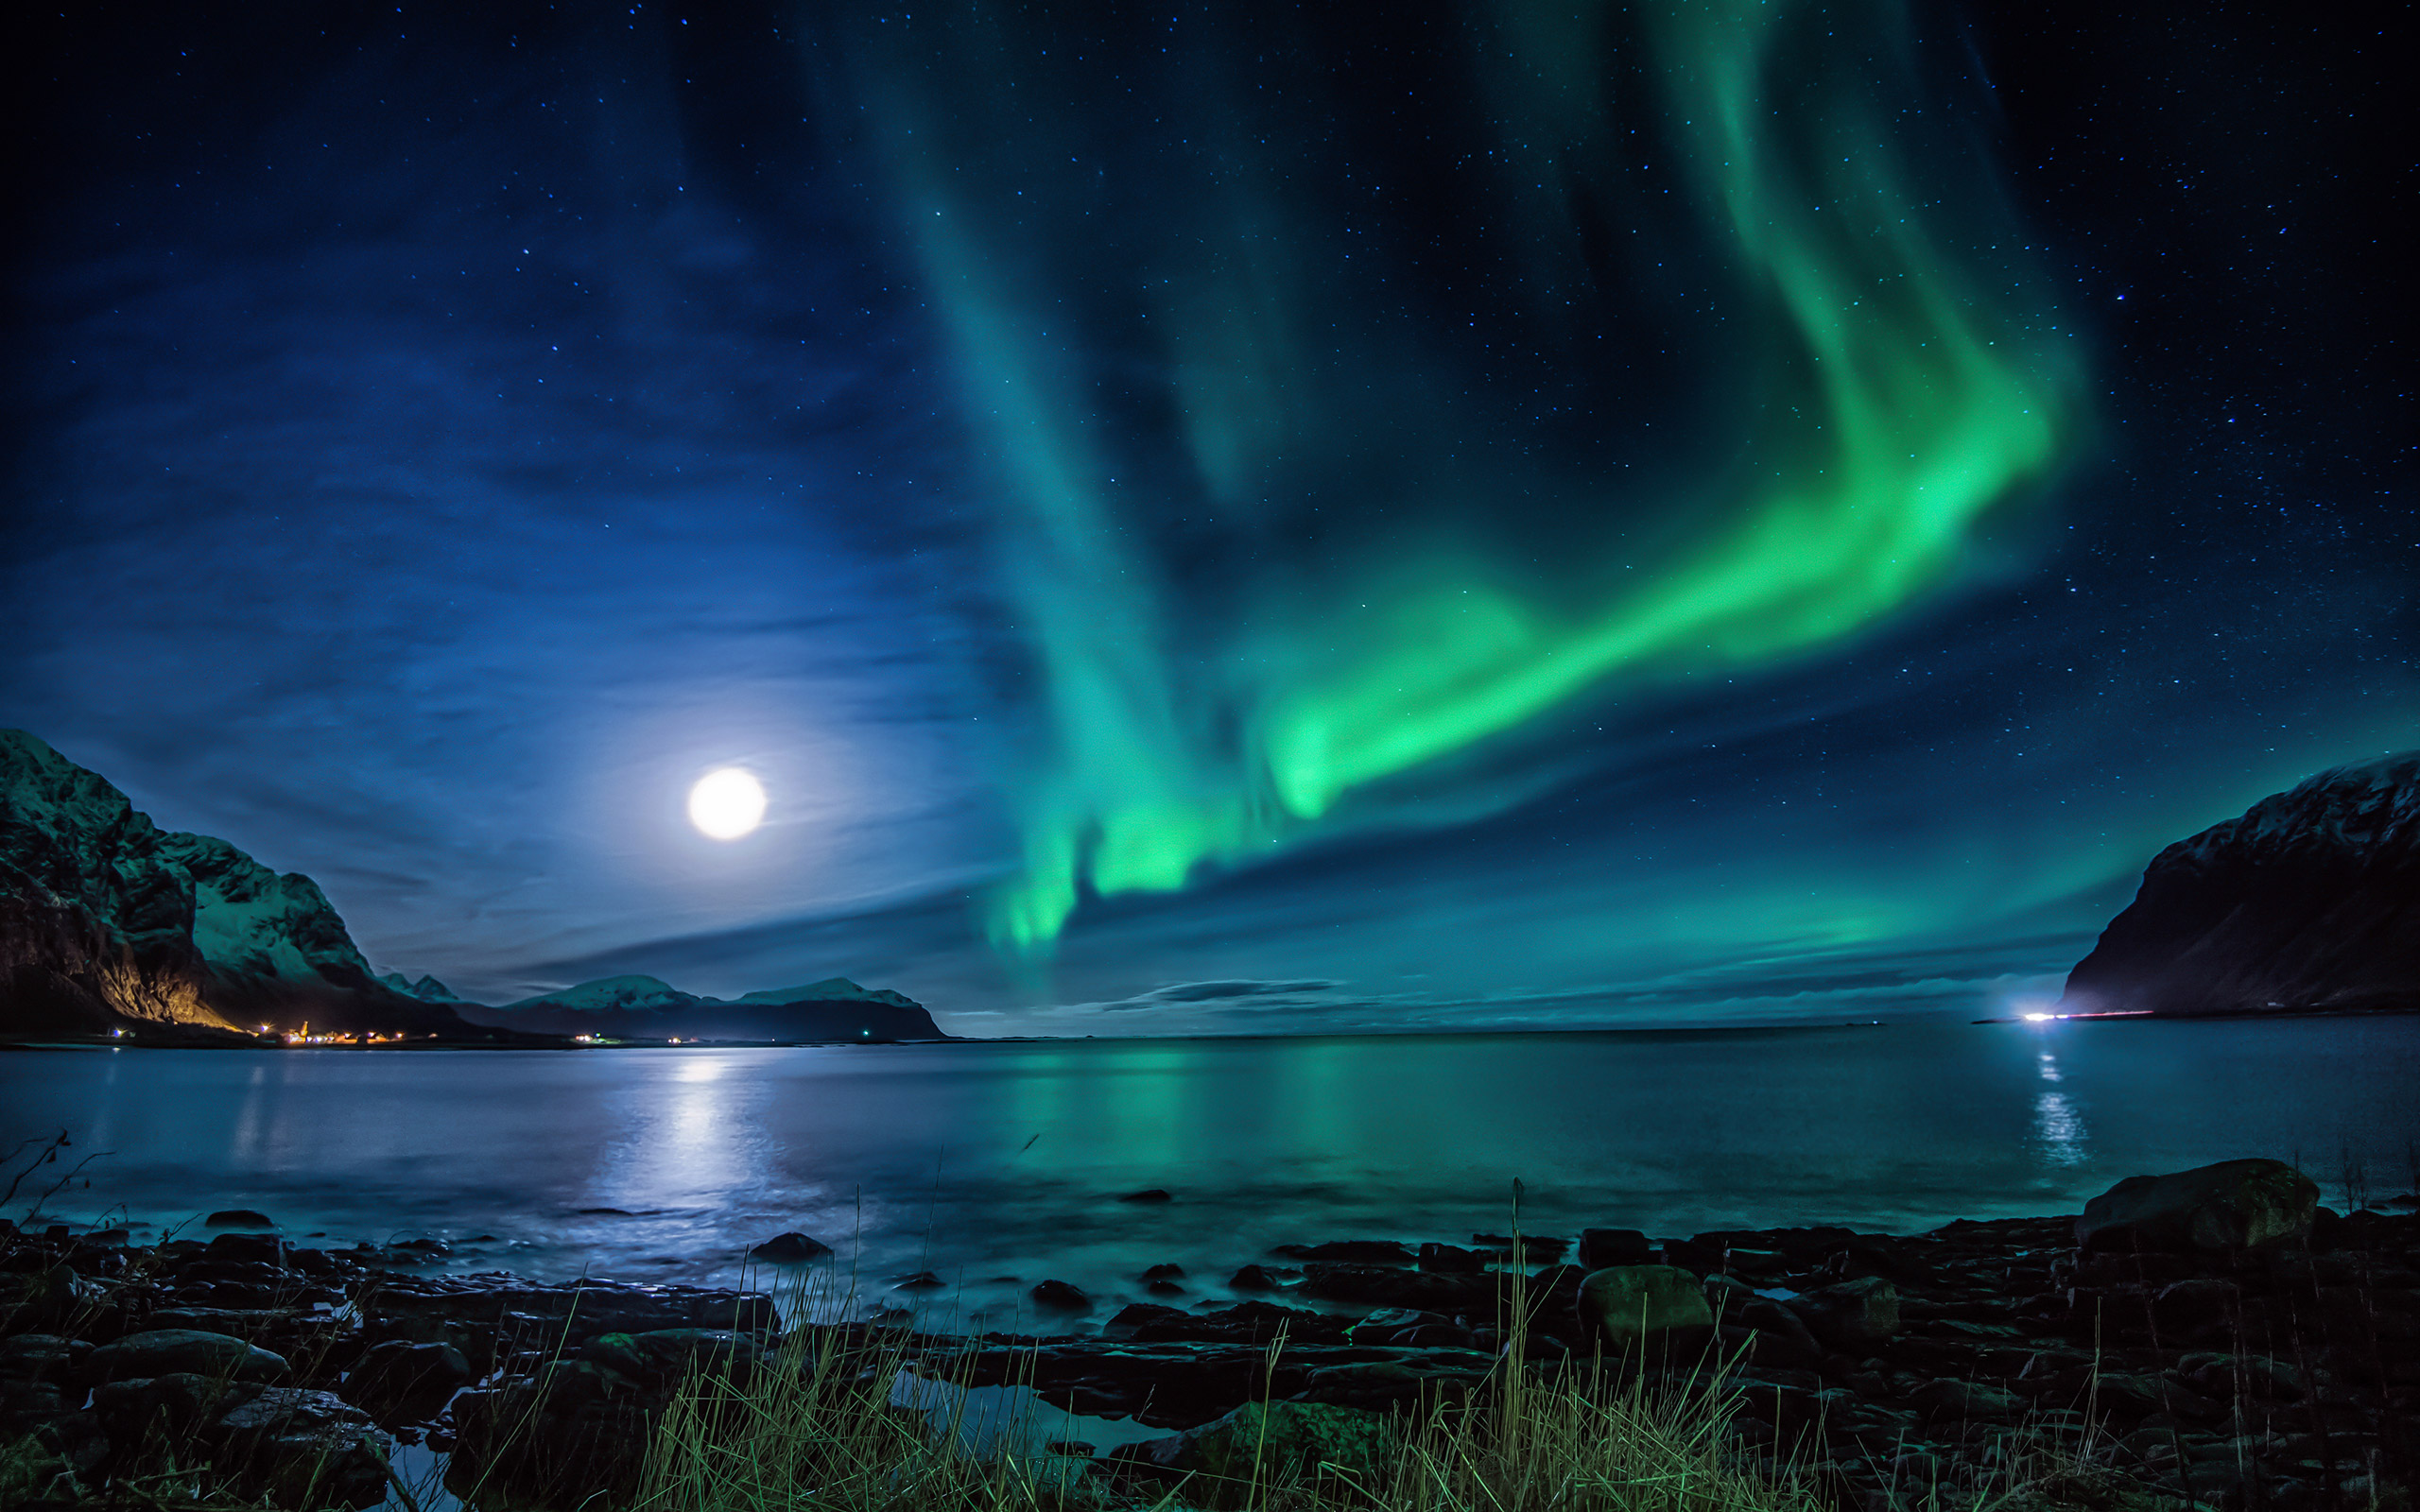 Aurora Borealis Moon Night, HD Nature, 4k Wallpapers, Images ...